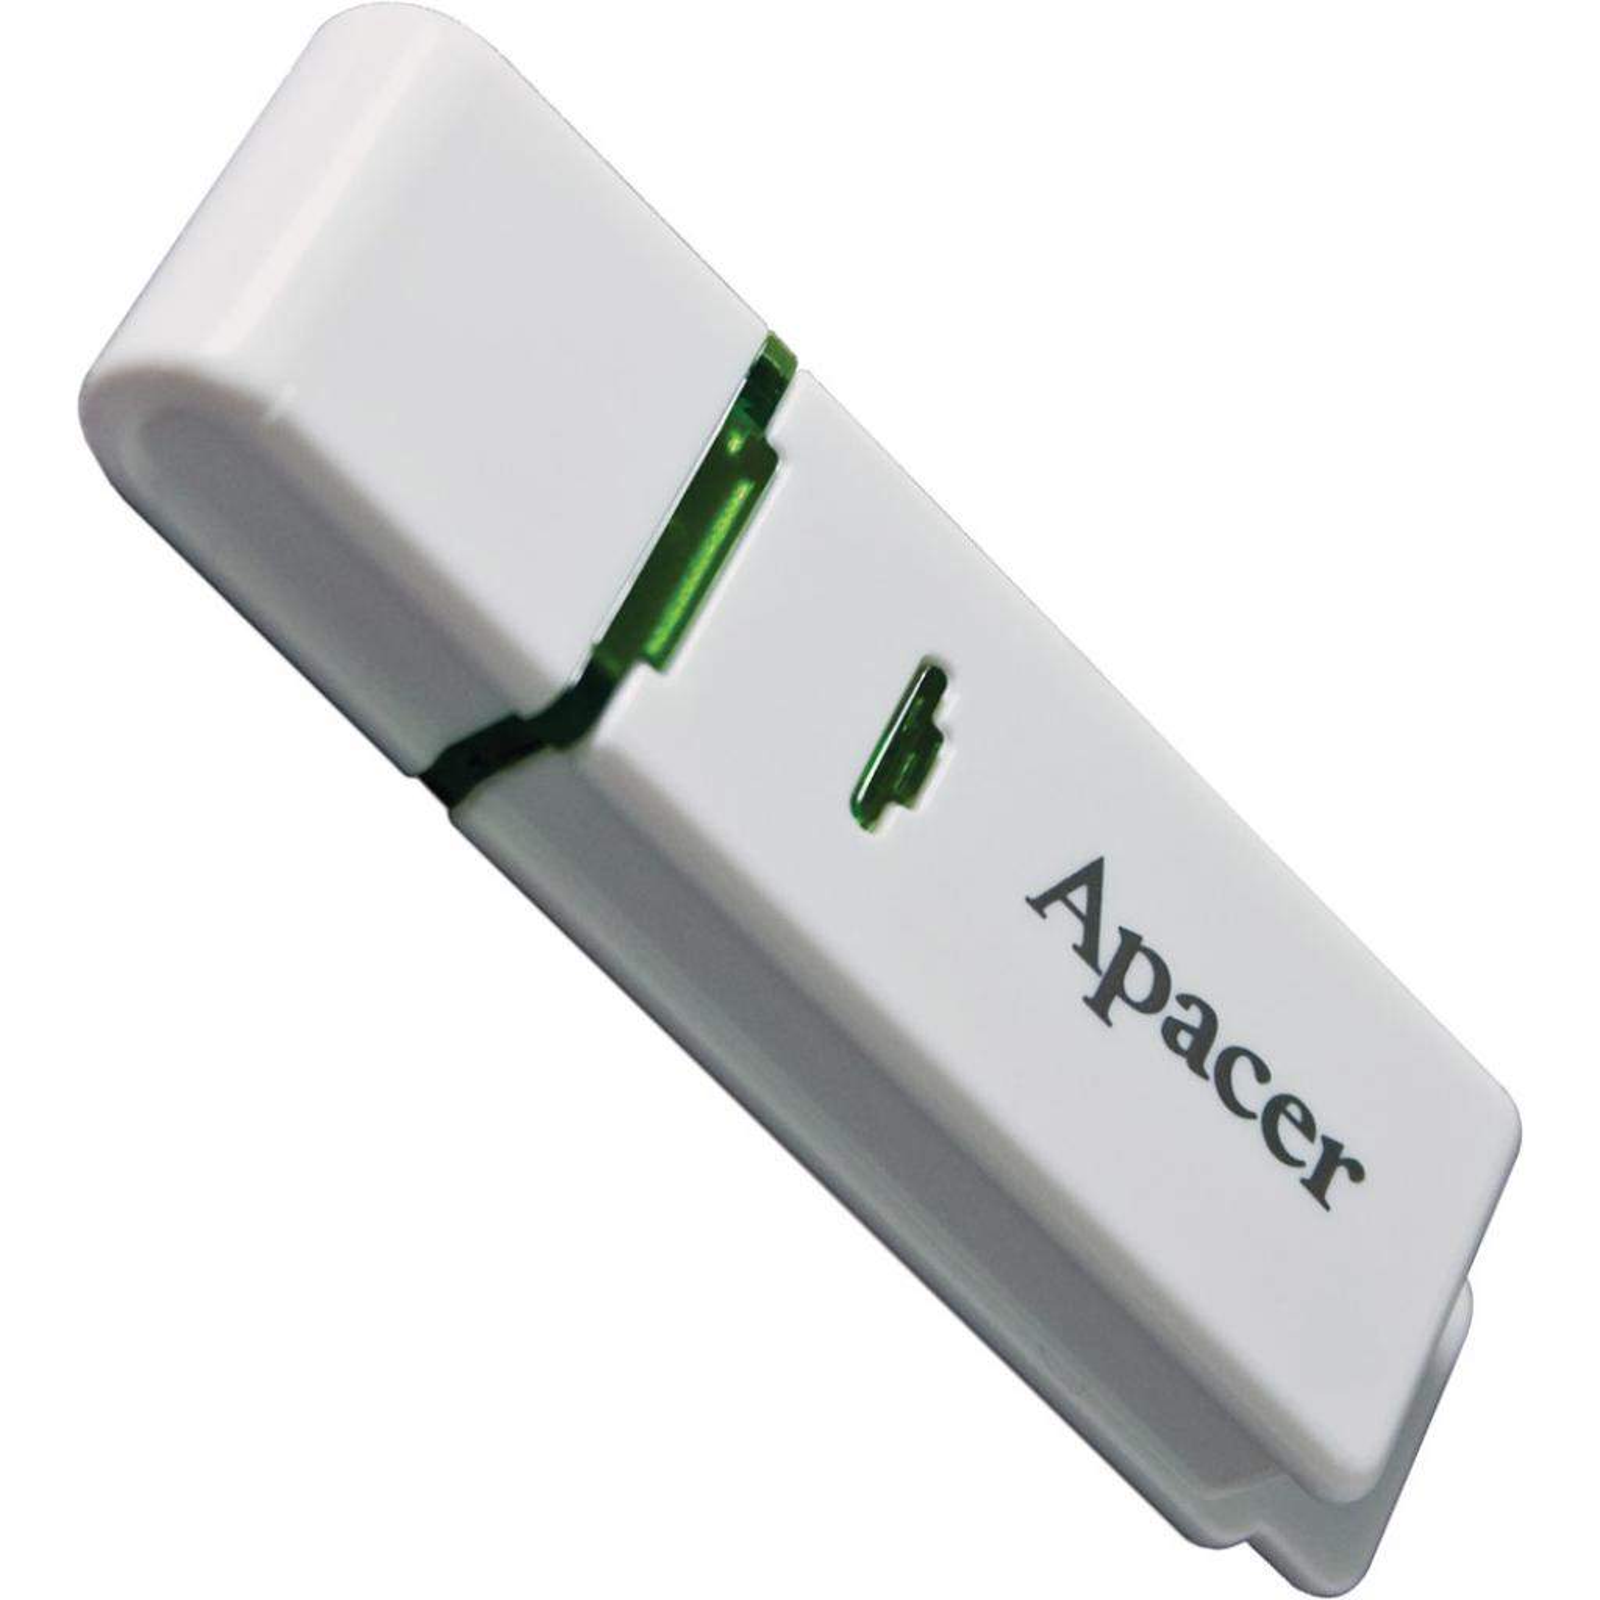 USB флеш накопитель Handy Steno AH223 white Apacer (AP4GAH223W-1) изображение 3